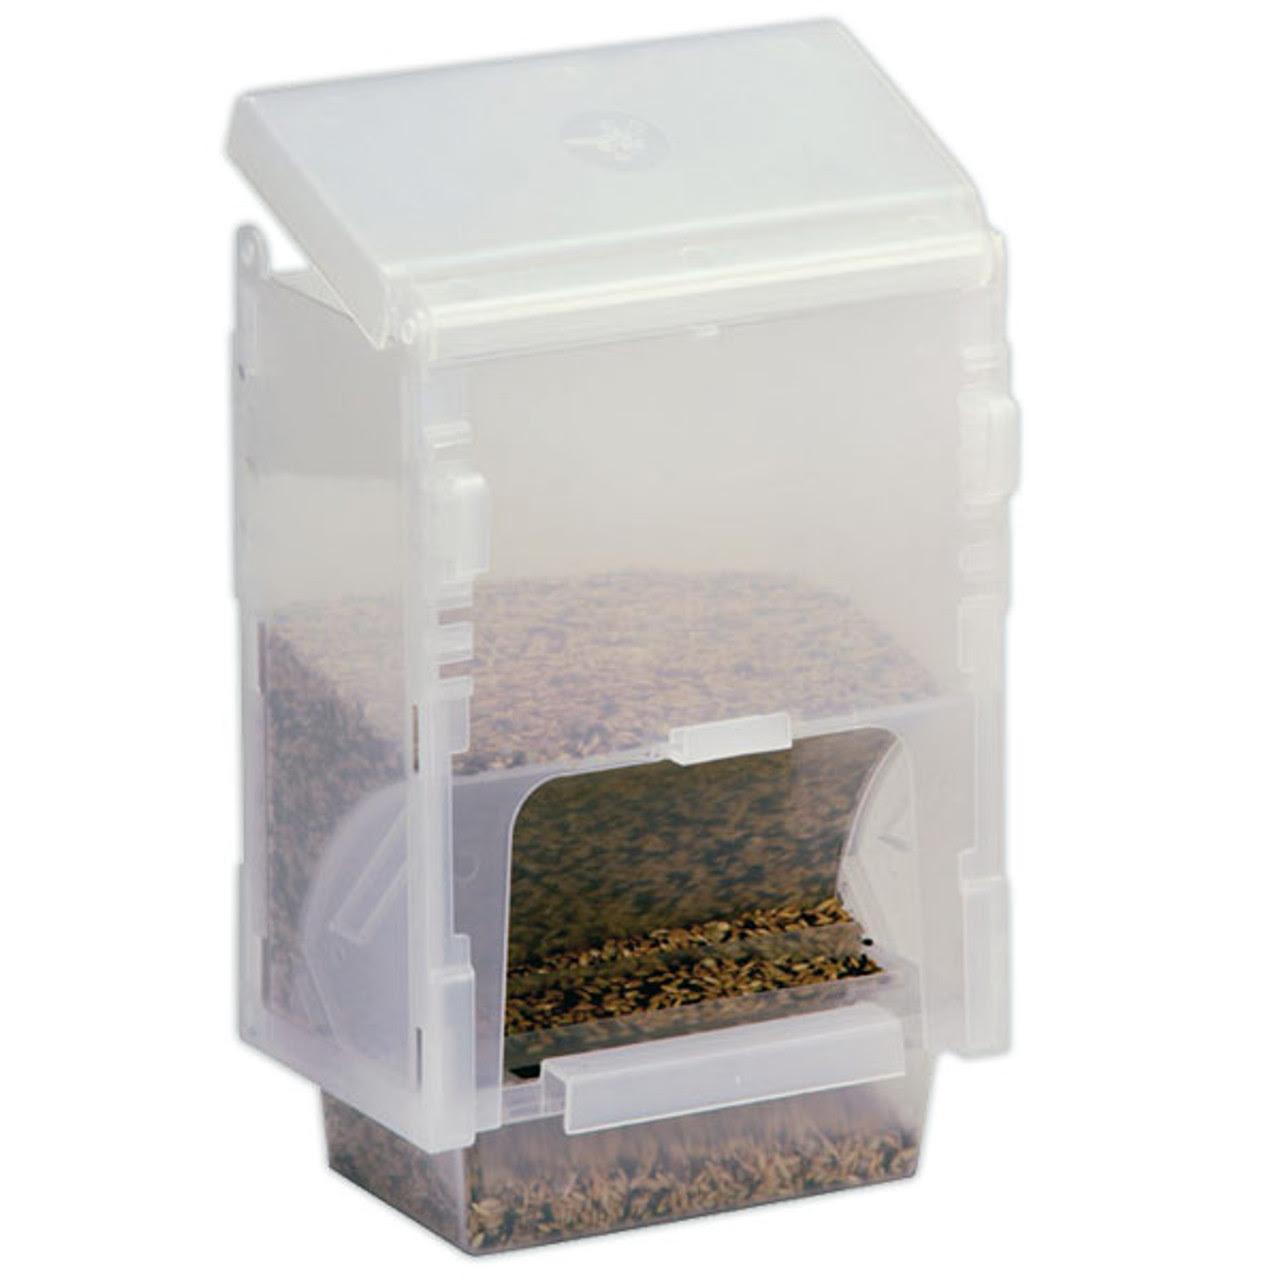 Economy Bird Feeder Dispenser for up to 2 lb bird food.